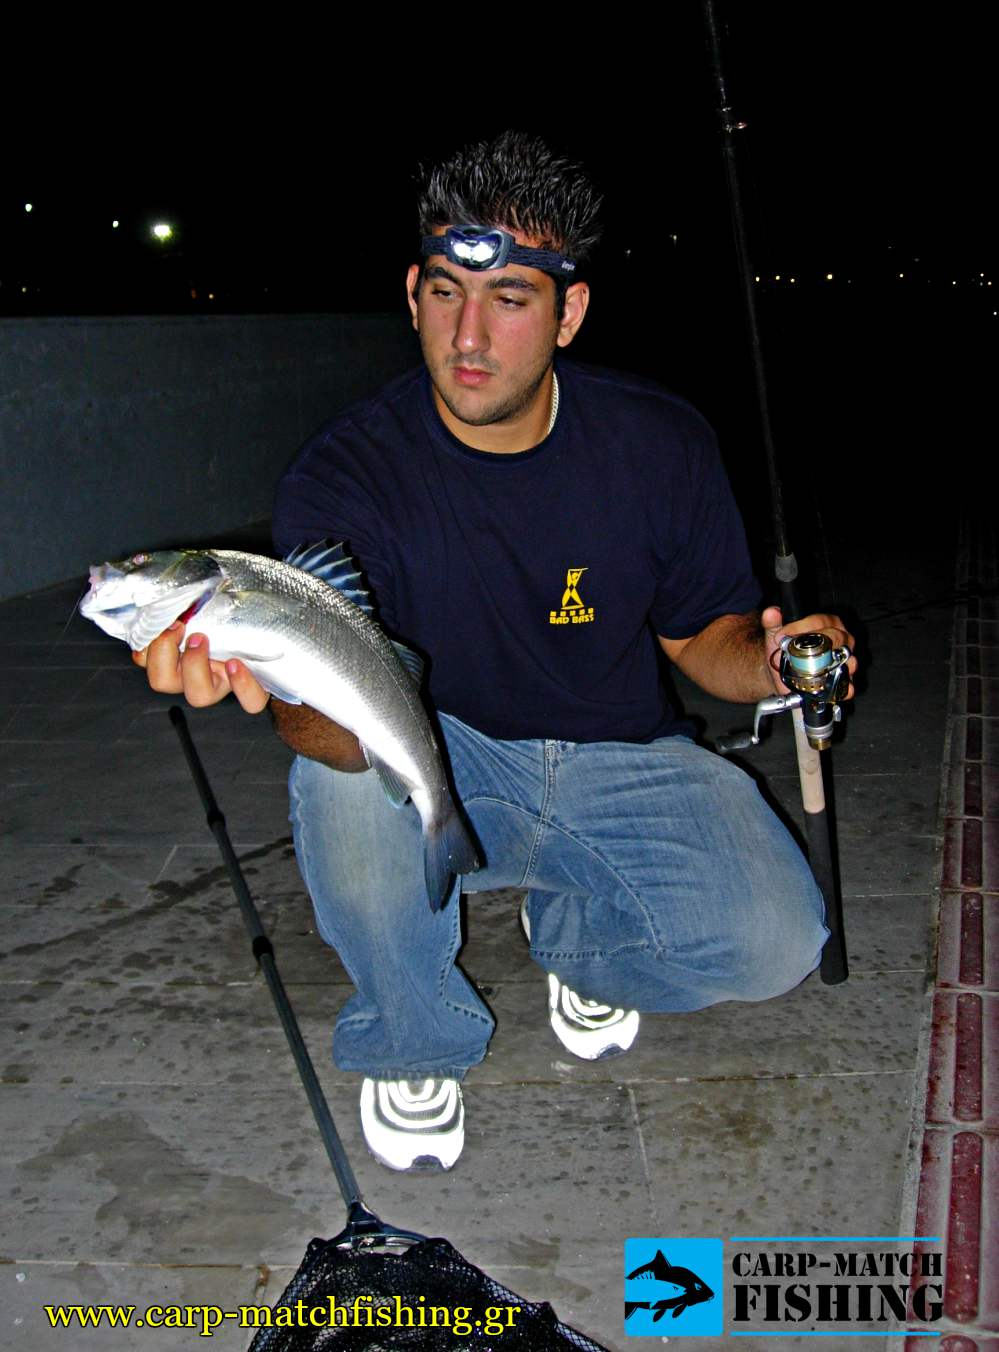 lavraki match me garida pan carpmatchfishing